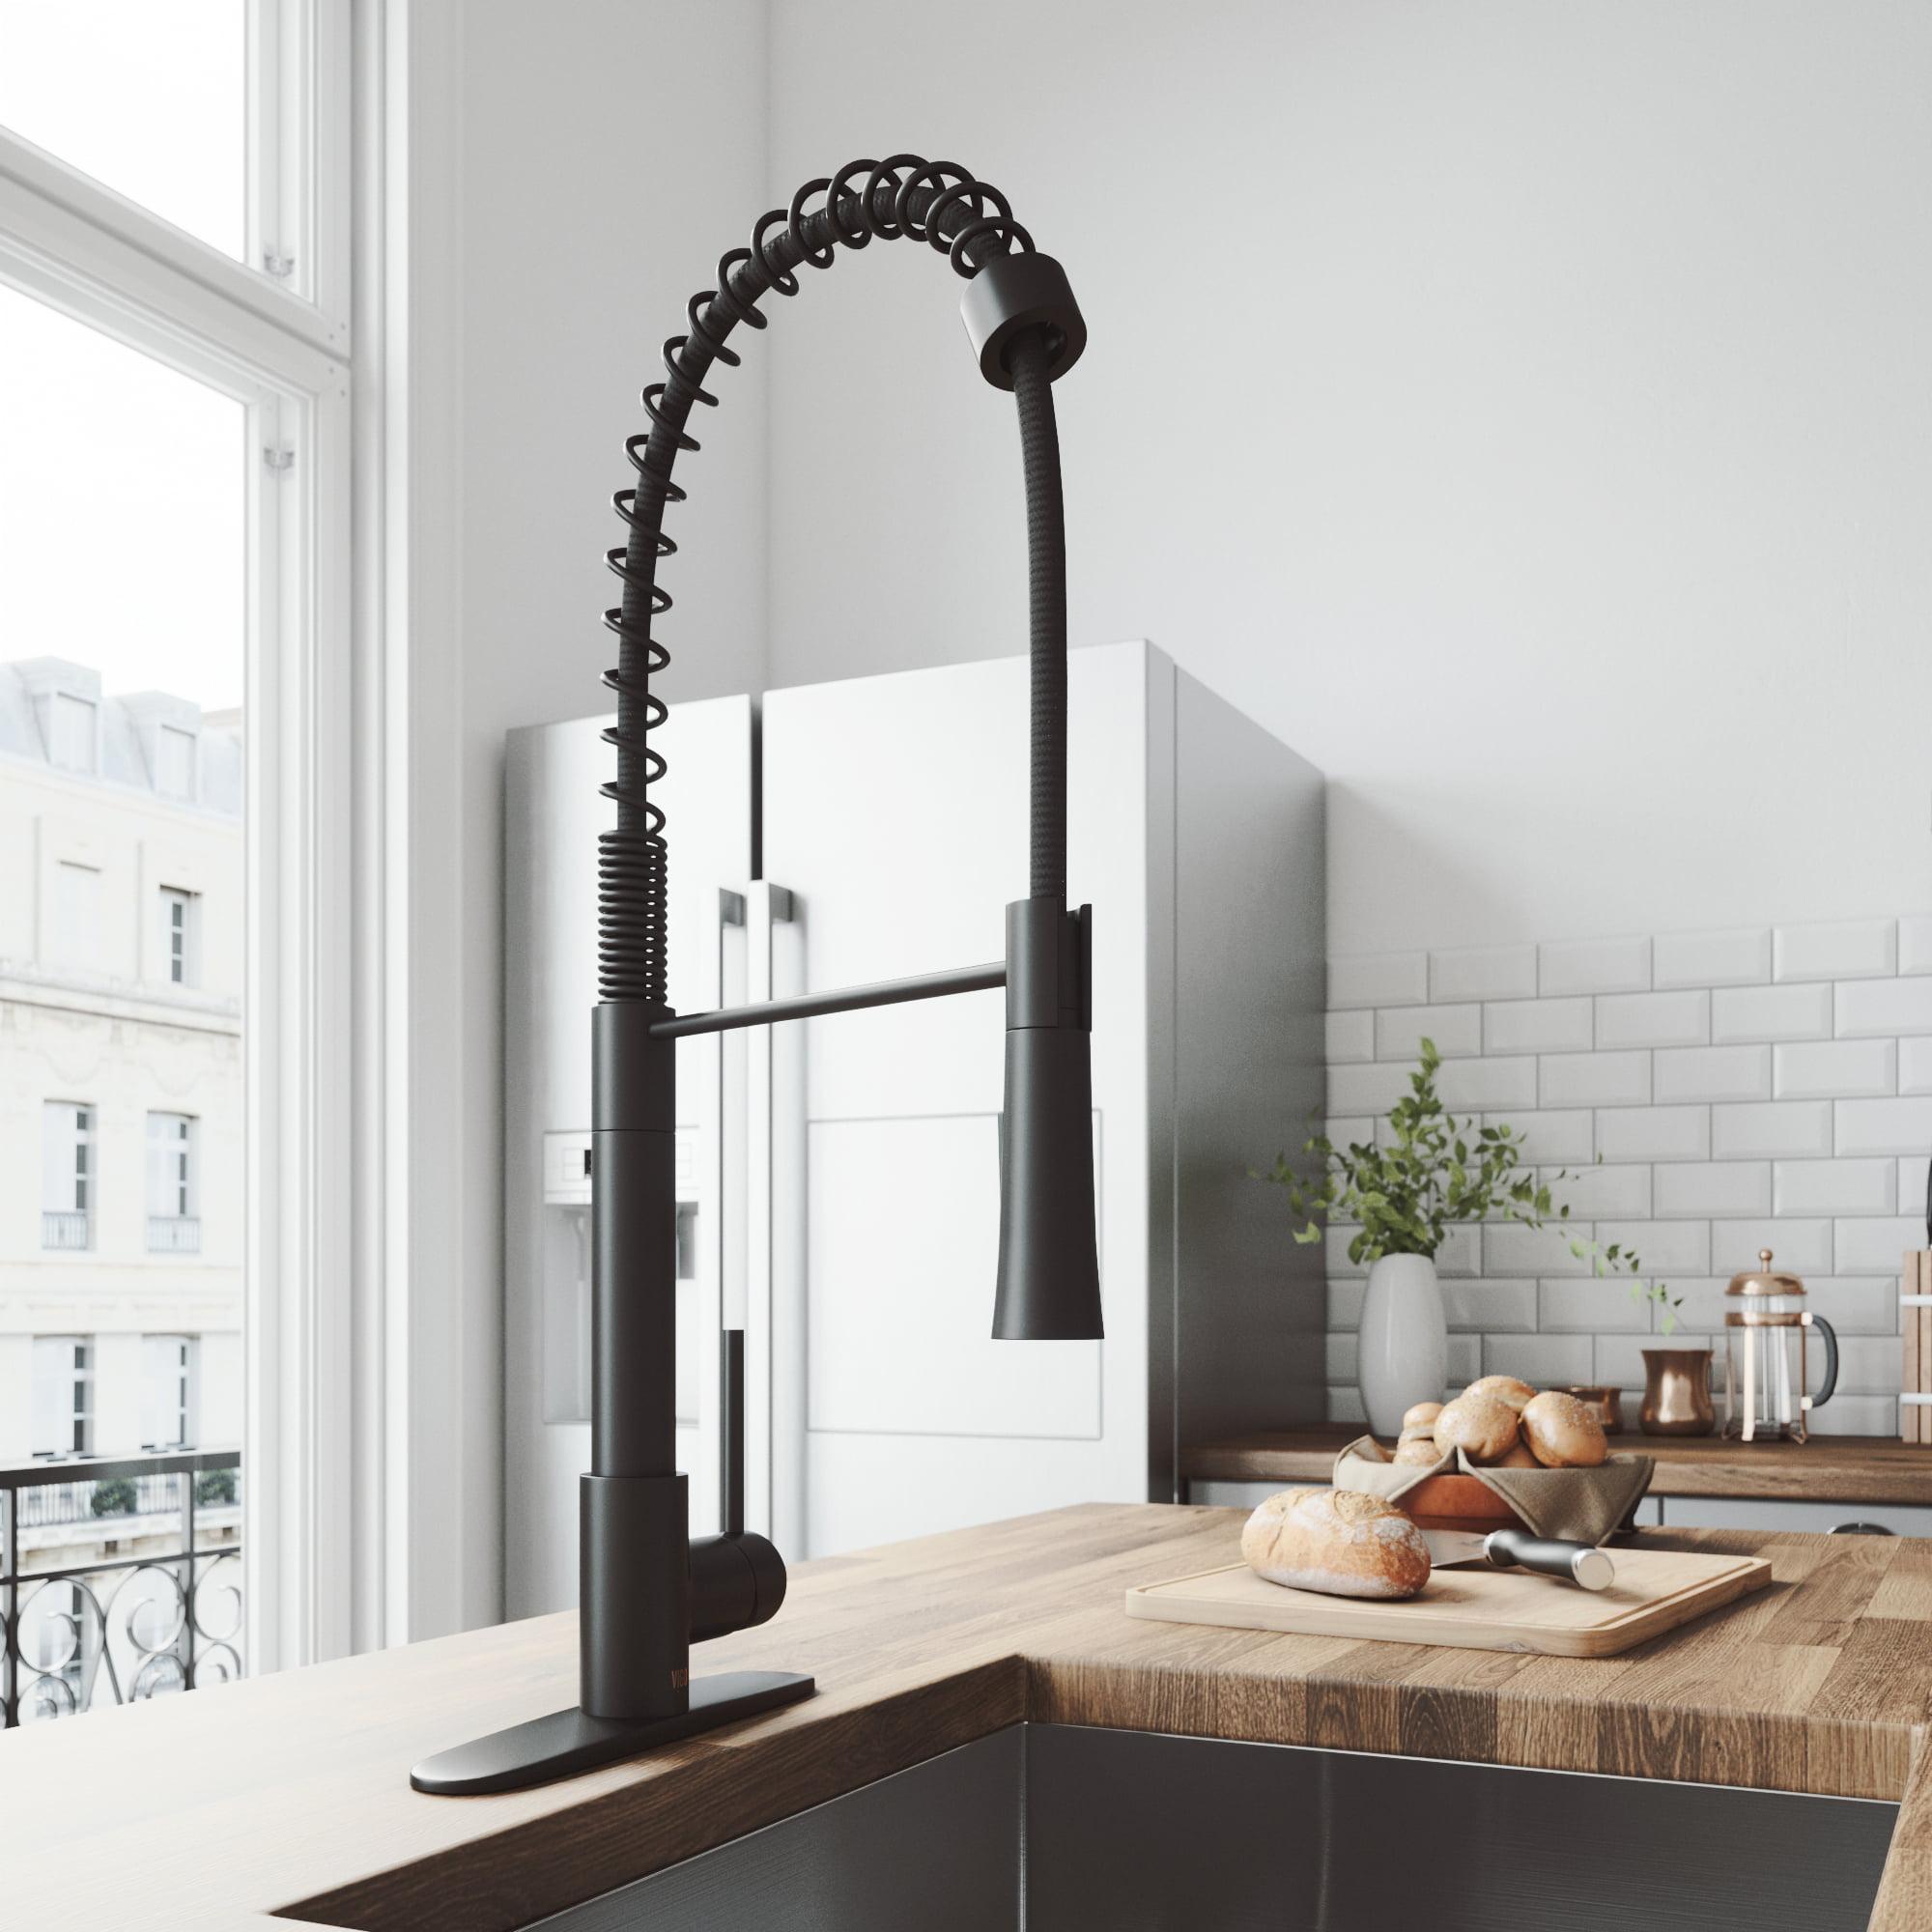 Vigo Laurelton Pull Down Spray Kitchen Faucet In Matte Black vigo laurelton pull-down spray kitchen faucet with deck plate, matte black  - walmart